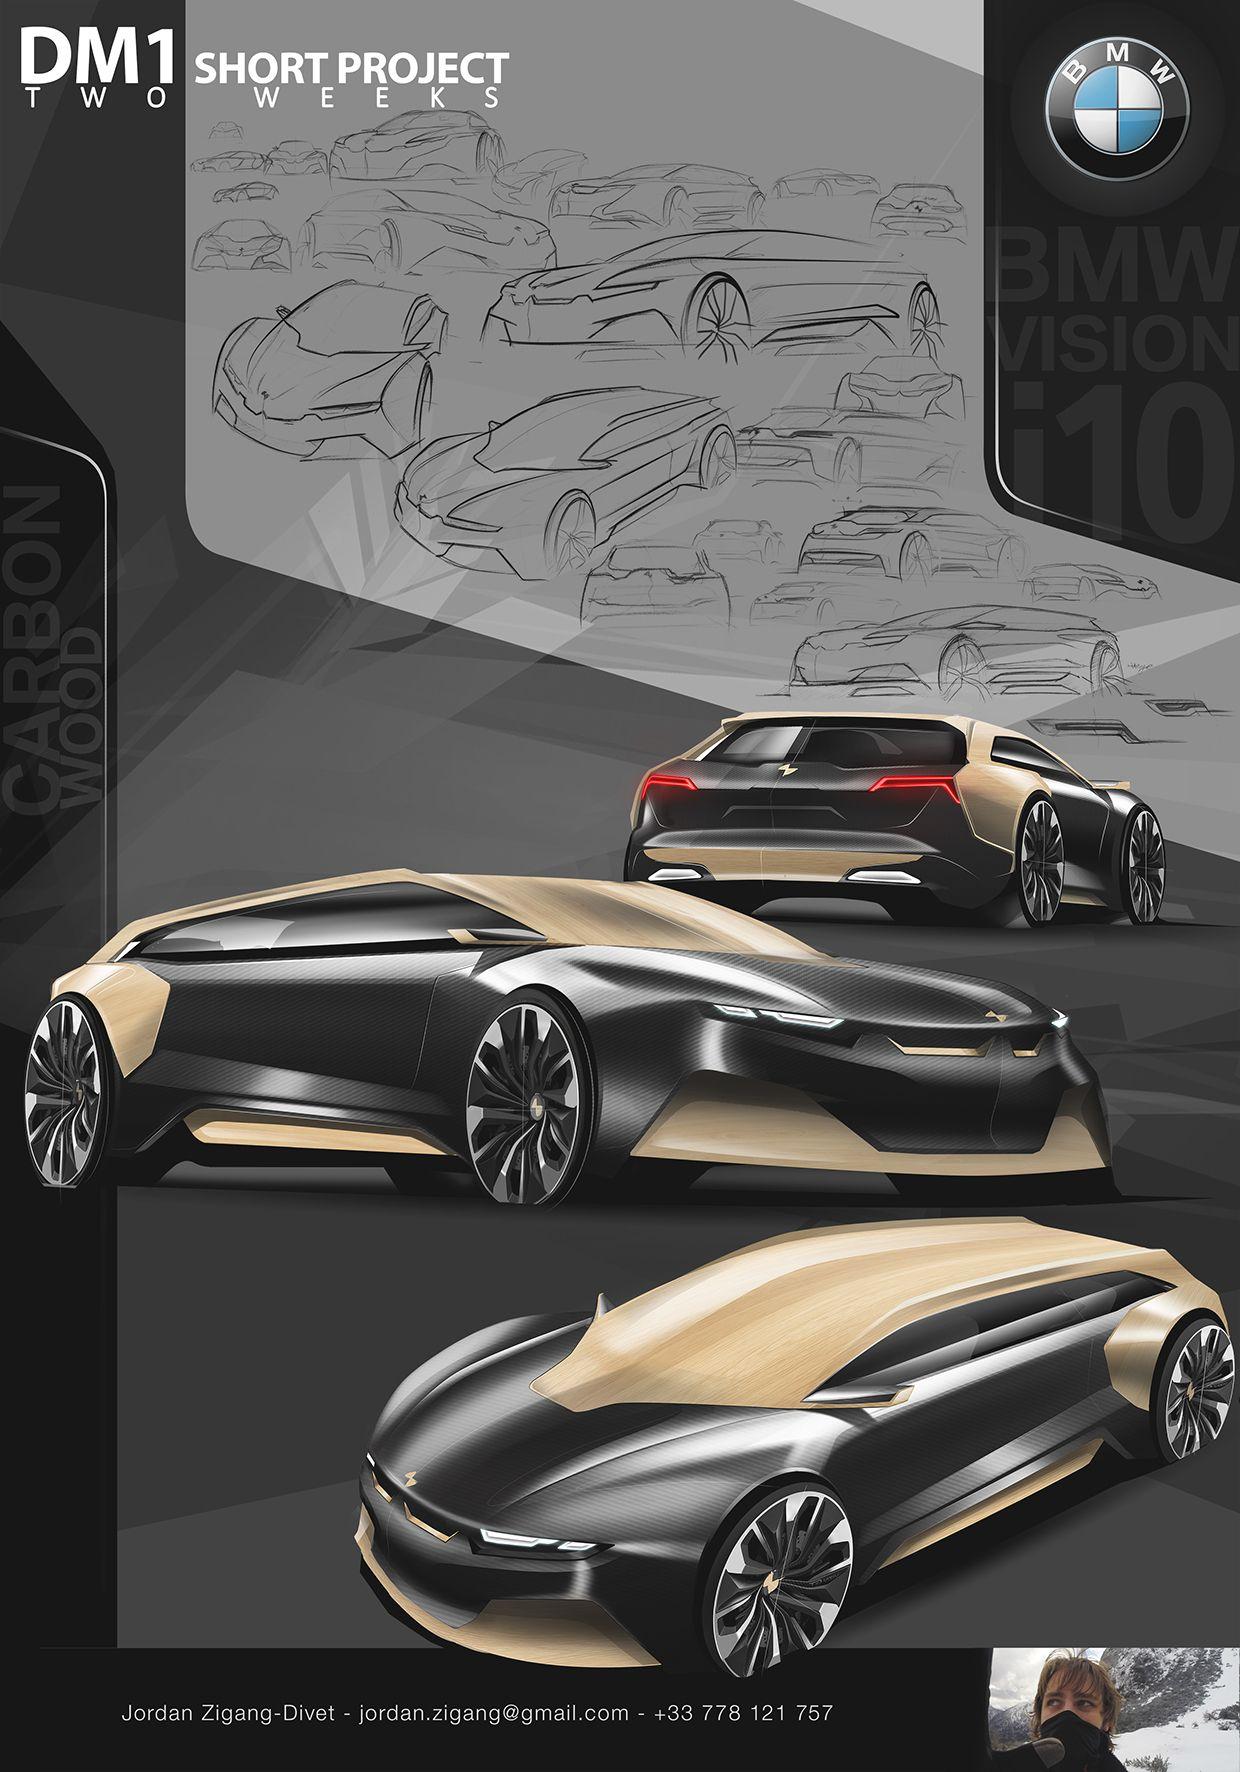 Https Www Behance Net Gallery 23891079 Bmw Vision I10 Short Project Automotive Design Bmw Concept Bike Design